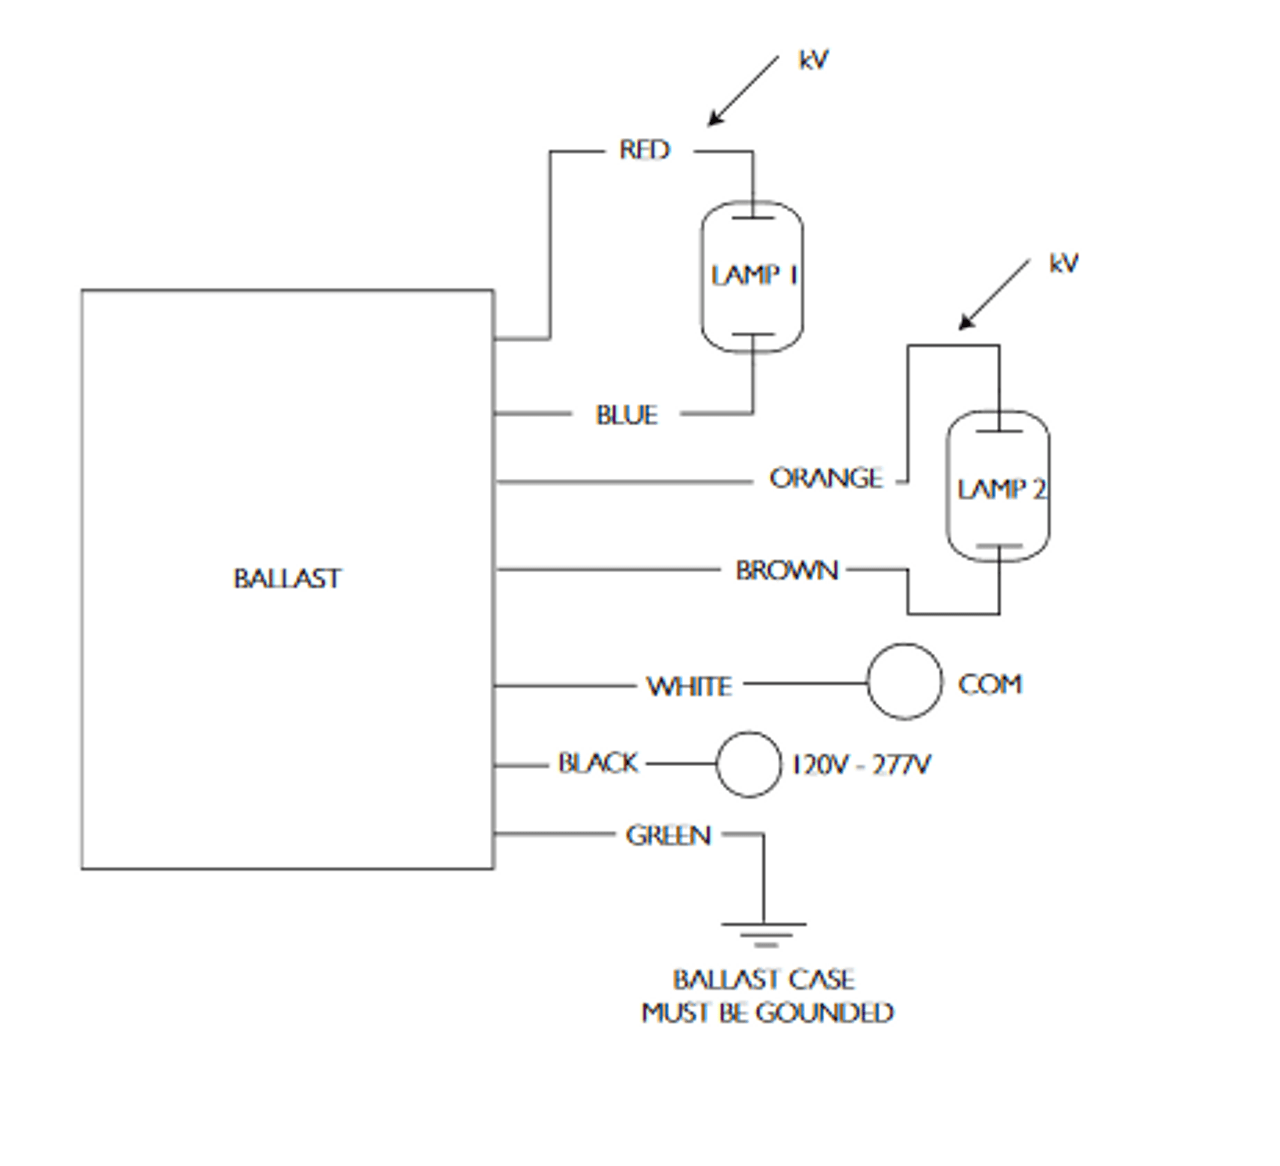 240v ballast wiring diagram wiring diagram technic on hps ballast wiring diagram bodine emergency advance metal halide  [ 1280 x 1166 Pixel ]